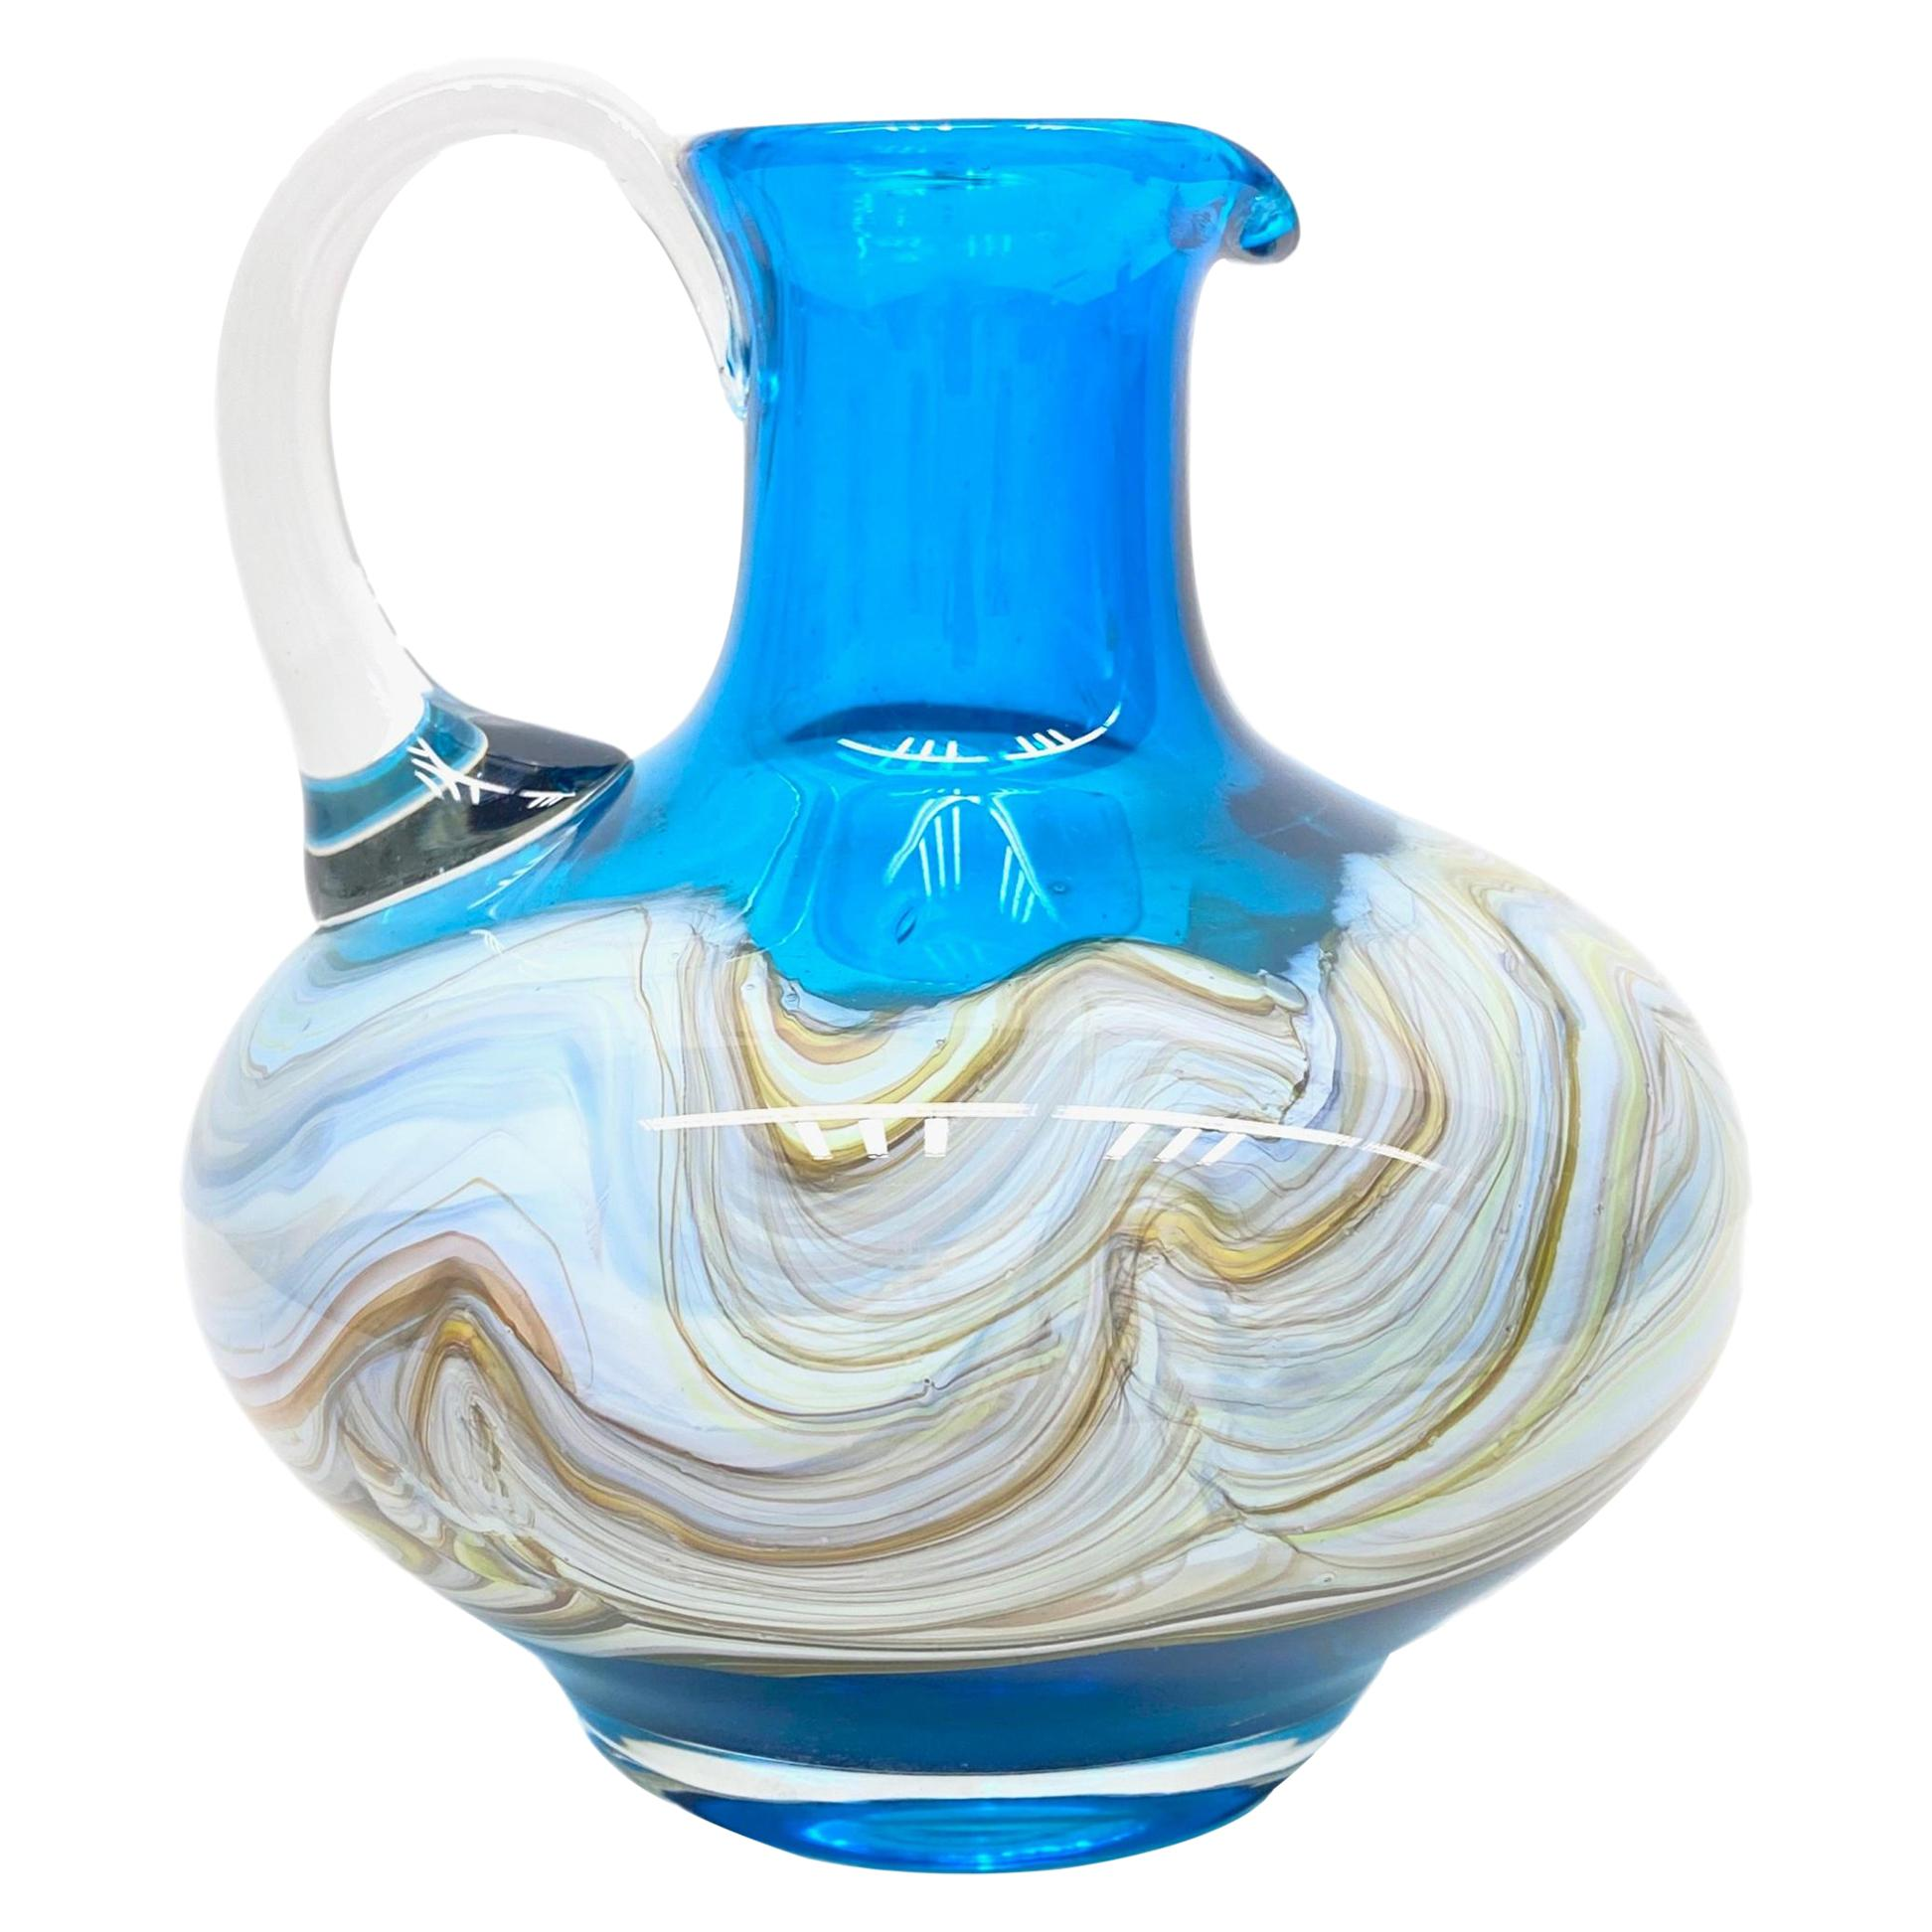 Blue and Multi-Color Swirl Glass Murano Venetian Vase, Italy, 1970s